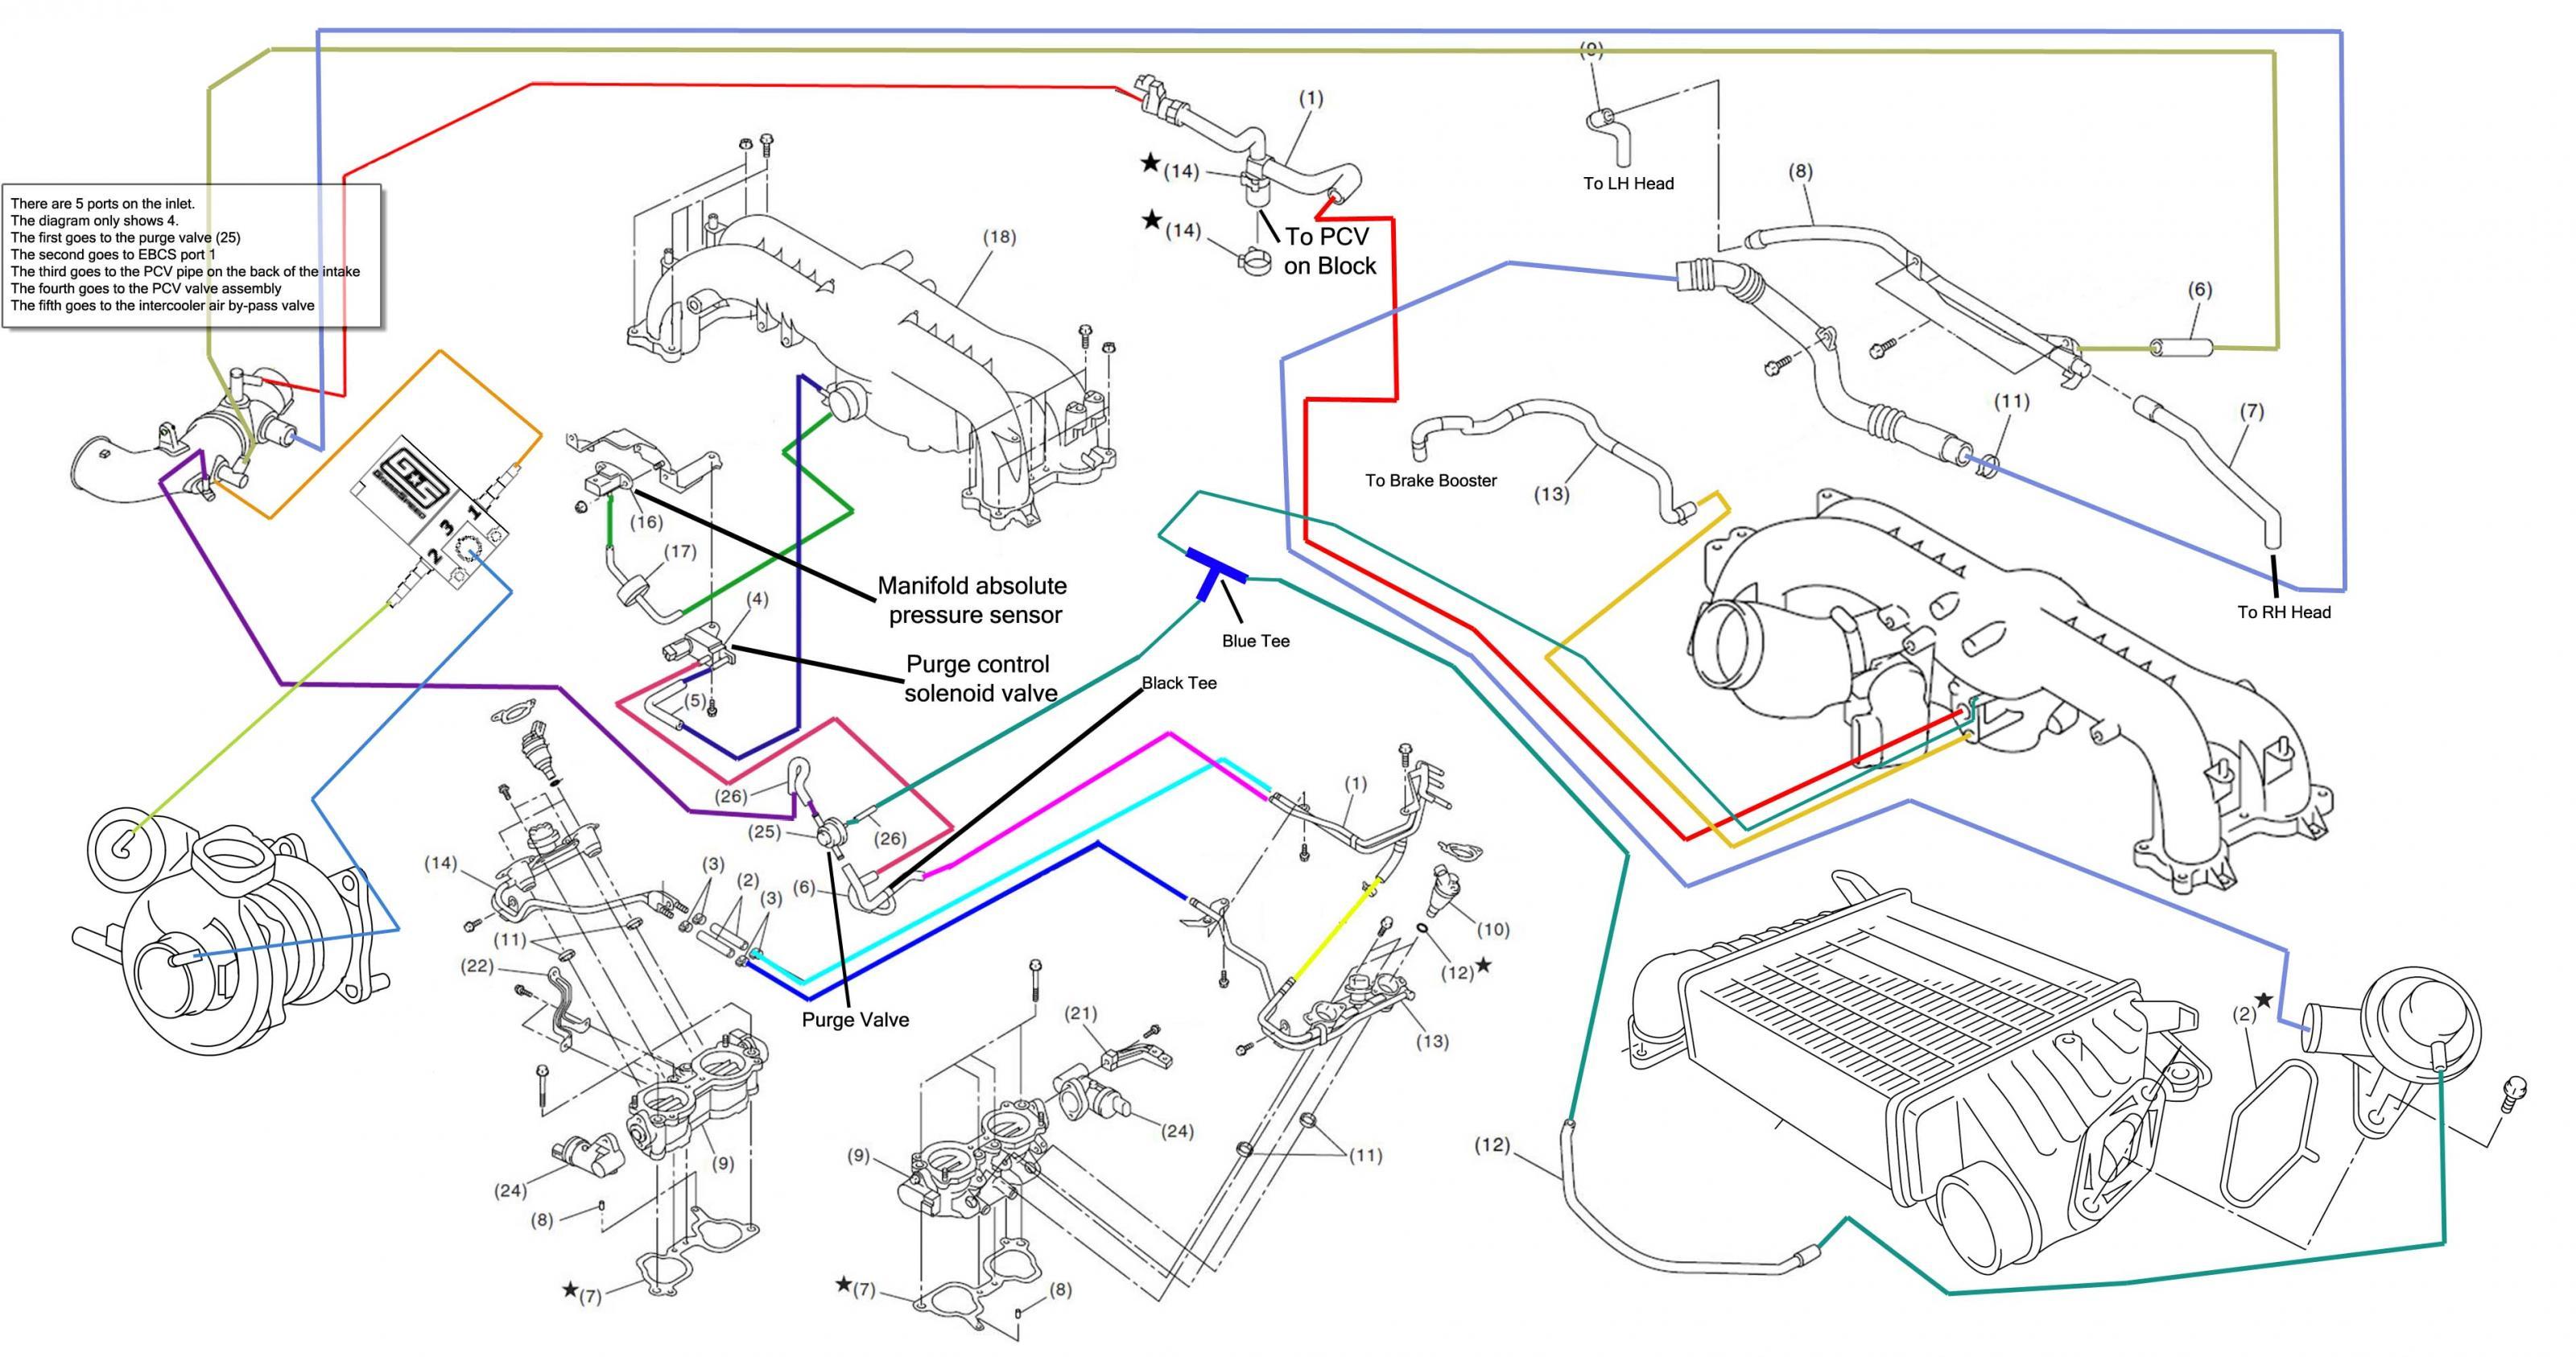 1999 Hyundai Sonata Fuse Box Diagram Elantra Wiring What Did You Do With Your Gen Ob Today Page Subaru 3200x1686